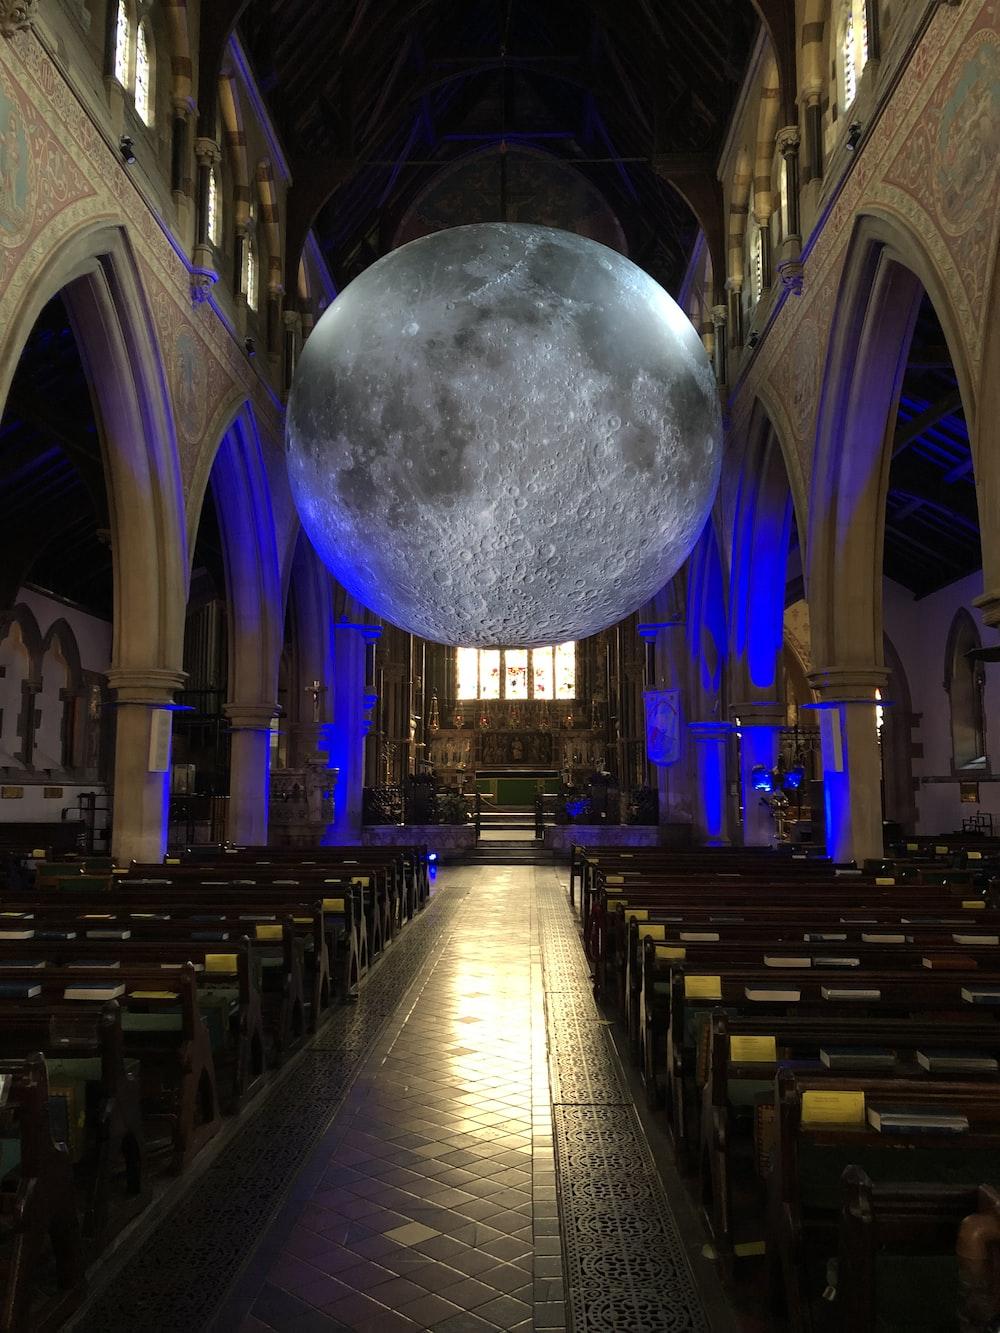 moon model inside a church